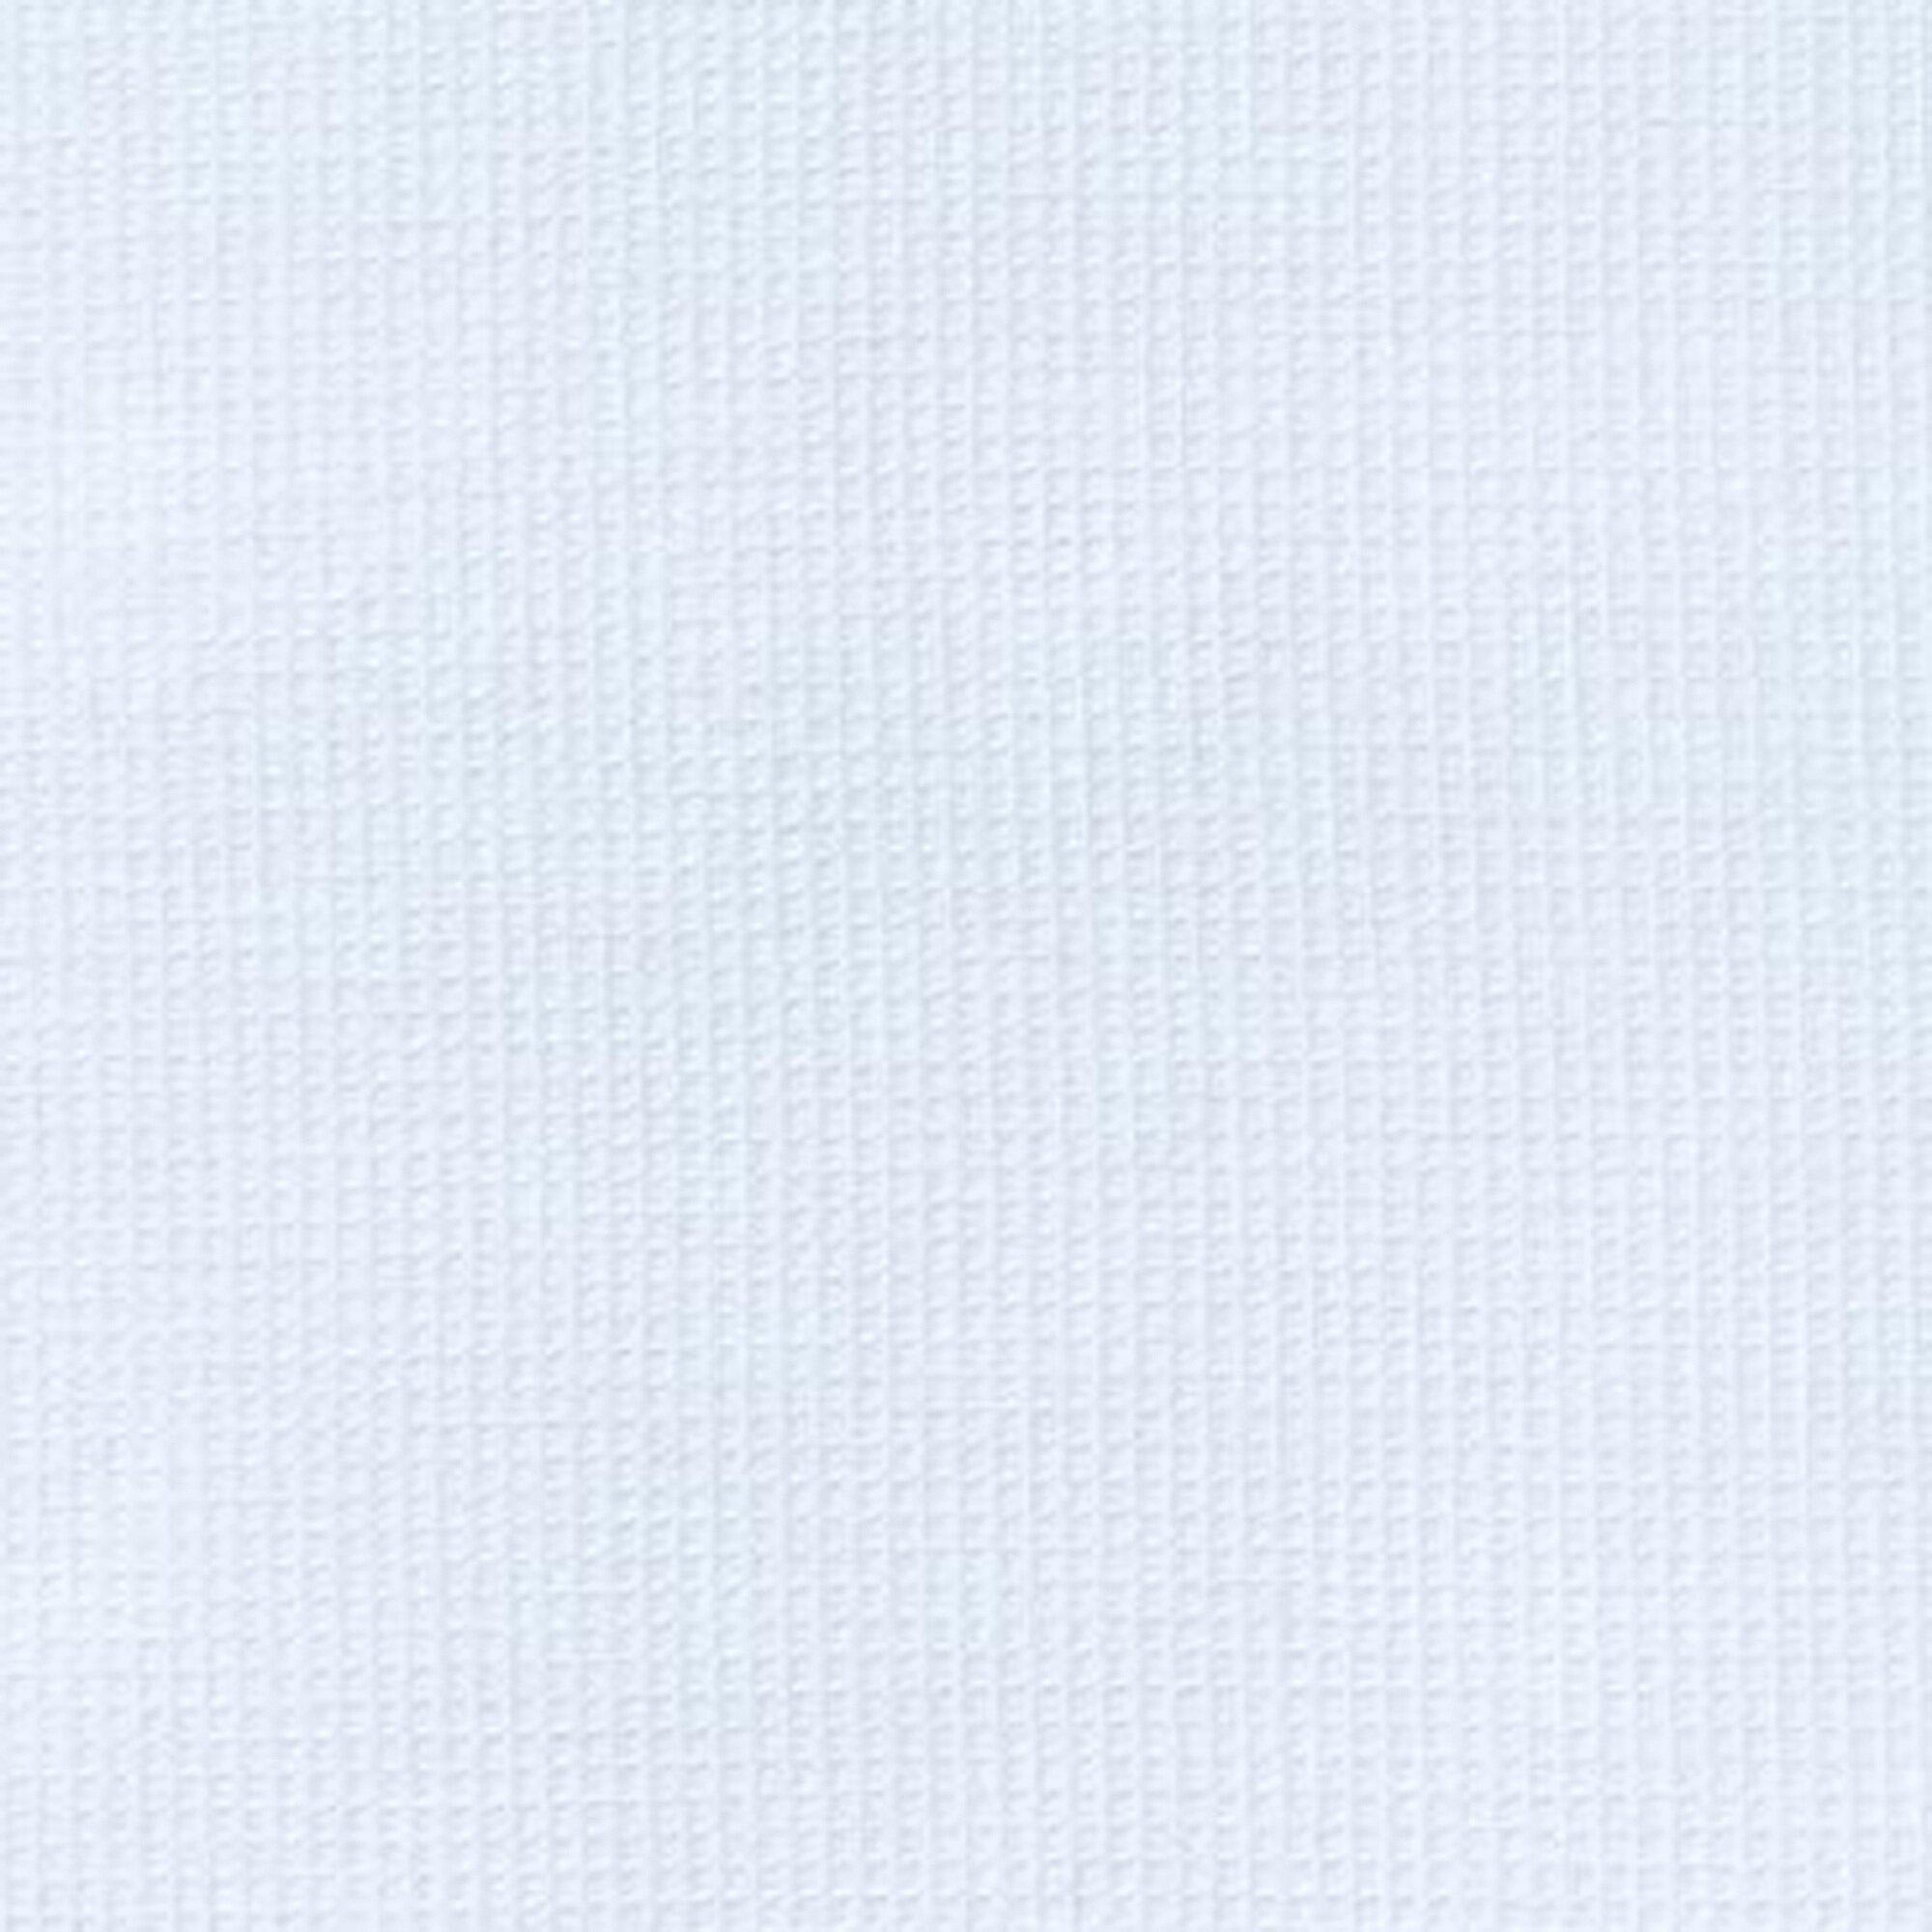 leipold-babykorb-wendy